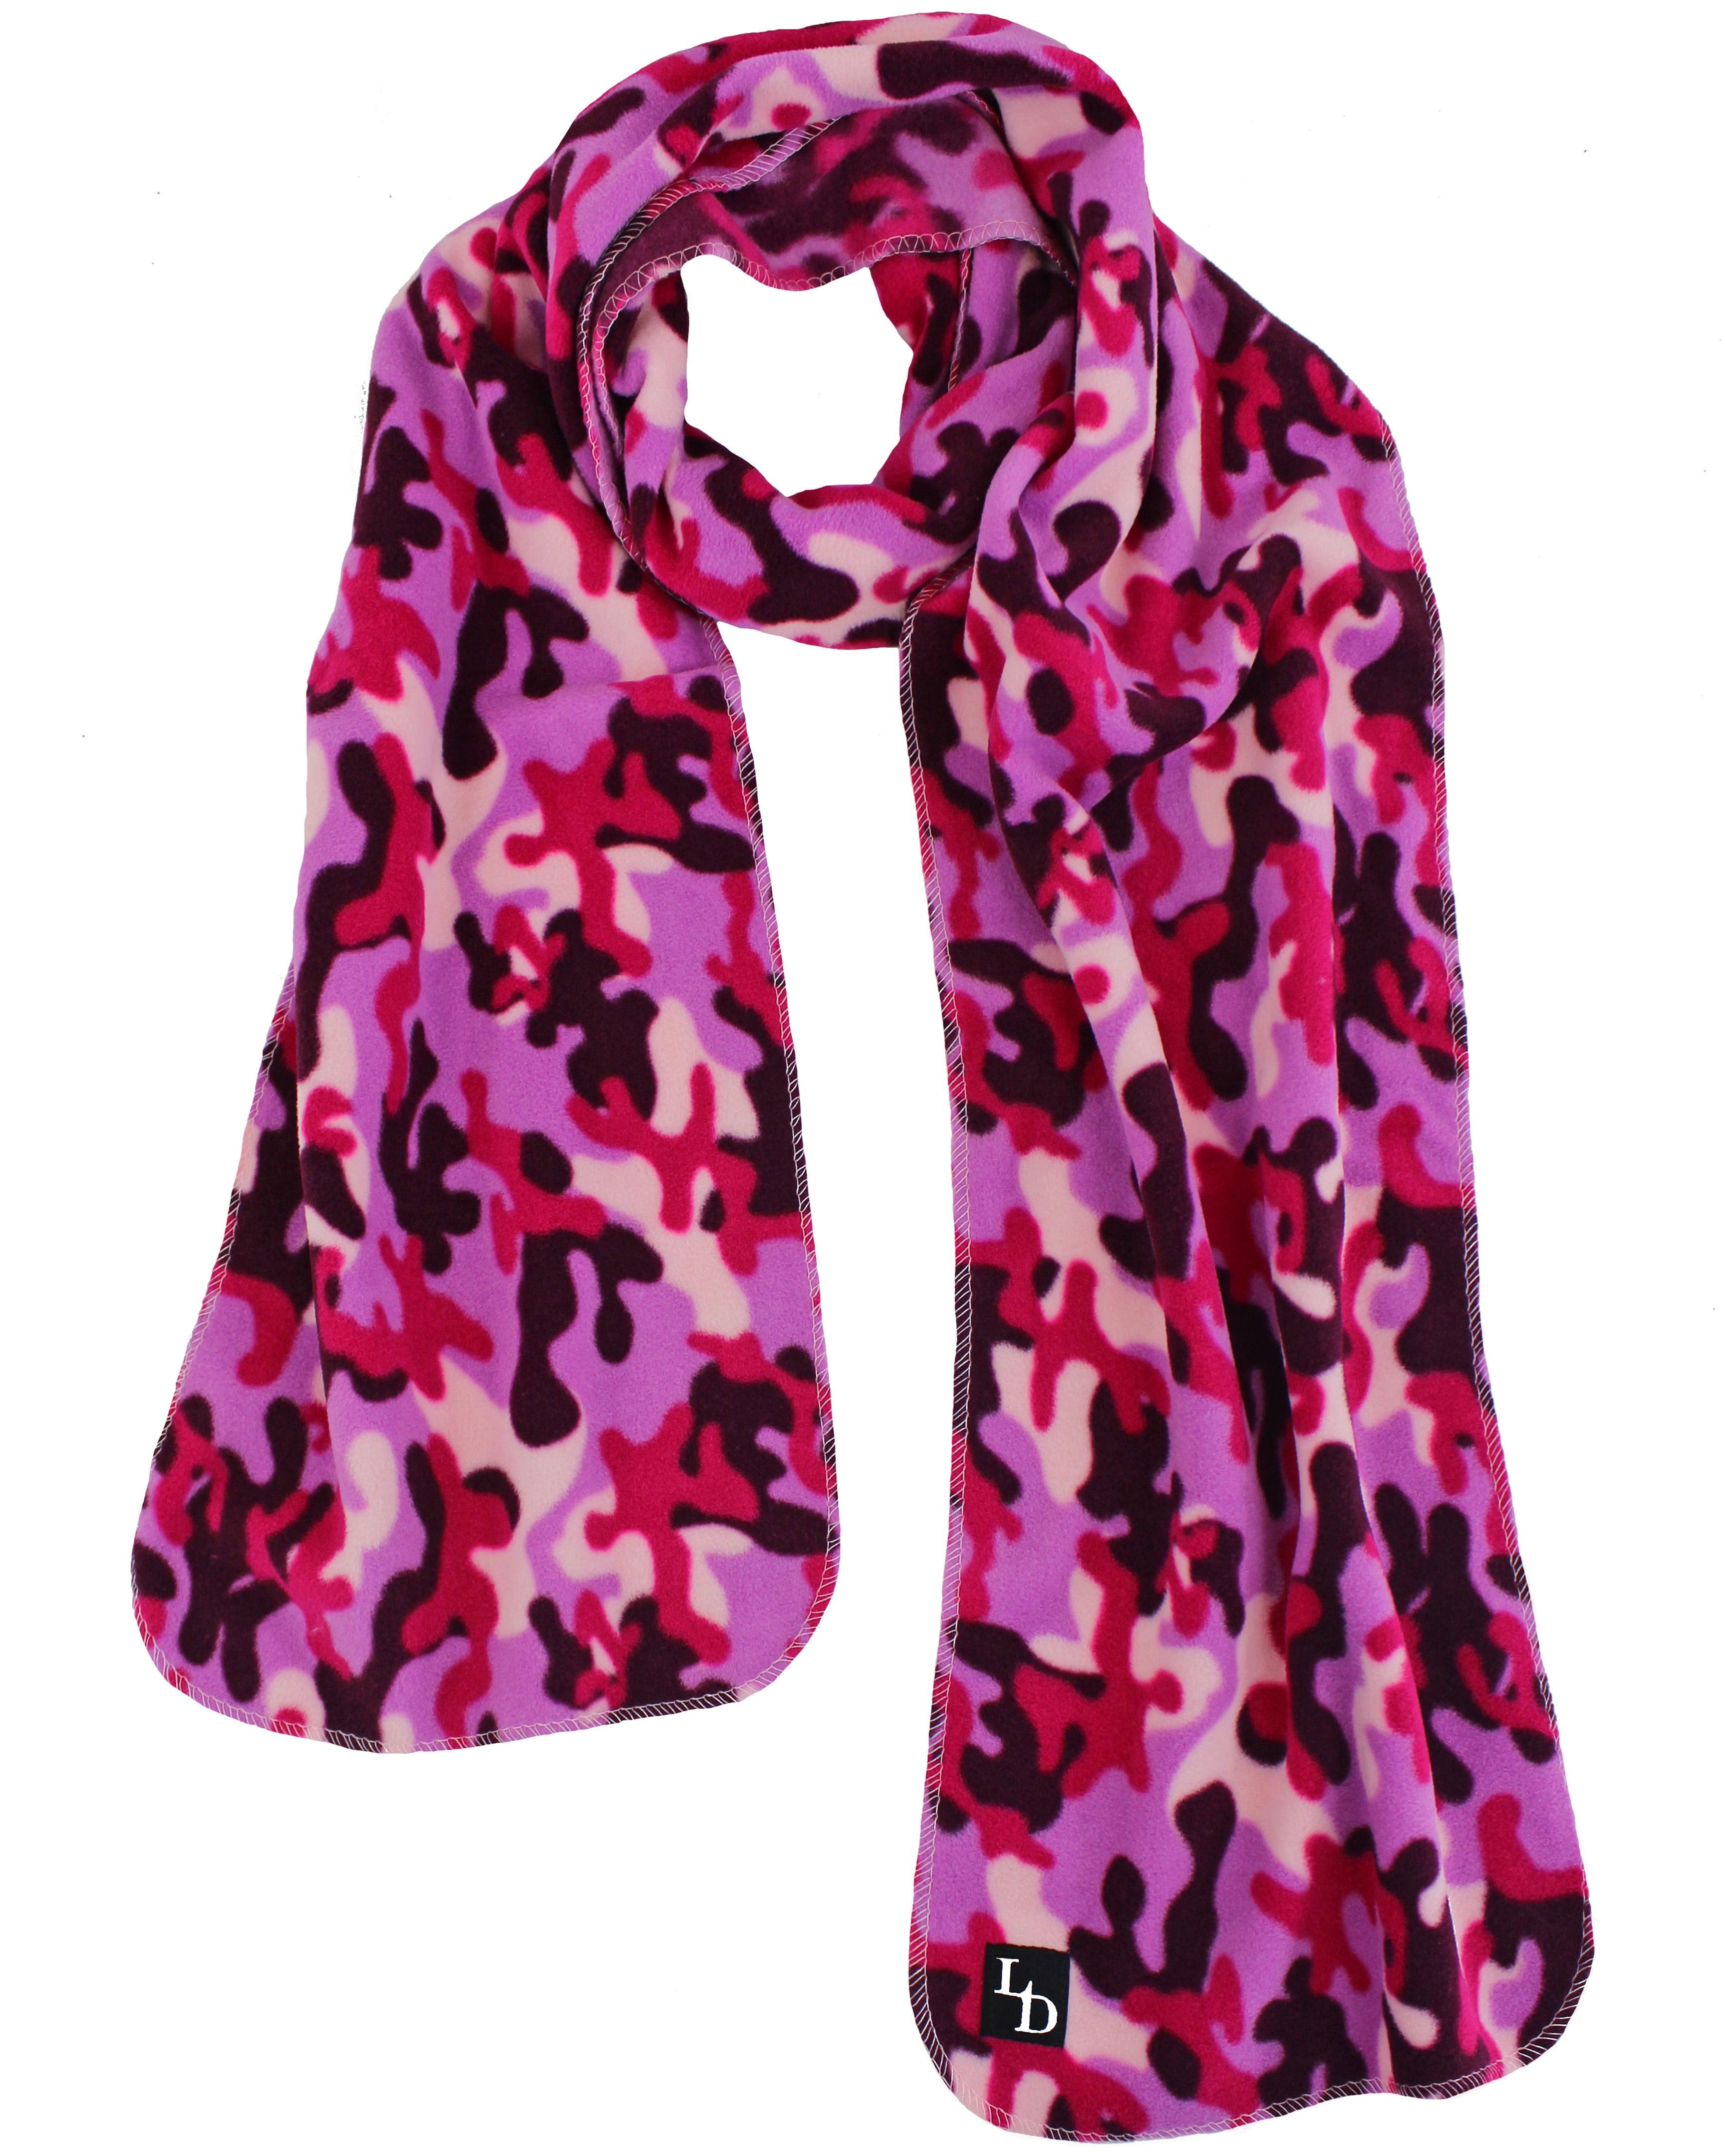 Camouflage Fleece Scarf Gloves & Hat Set - Walmart.com